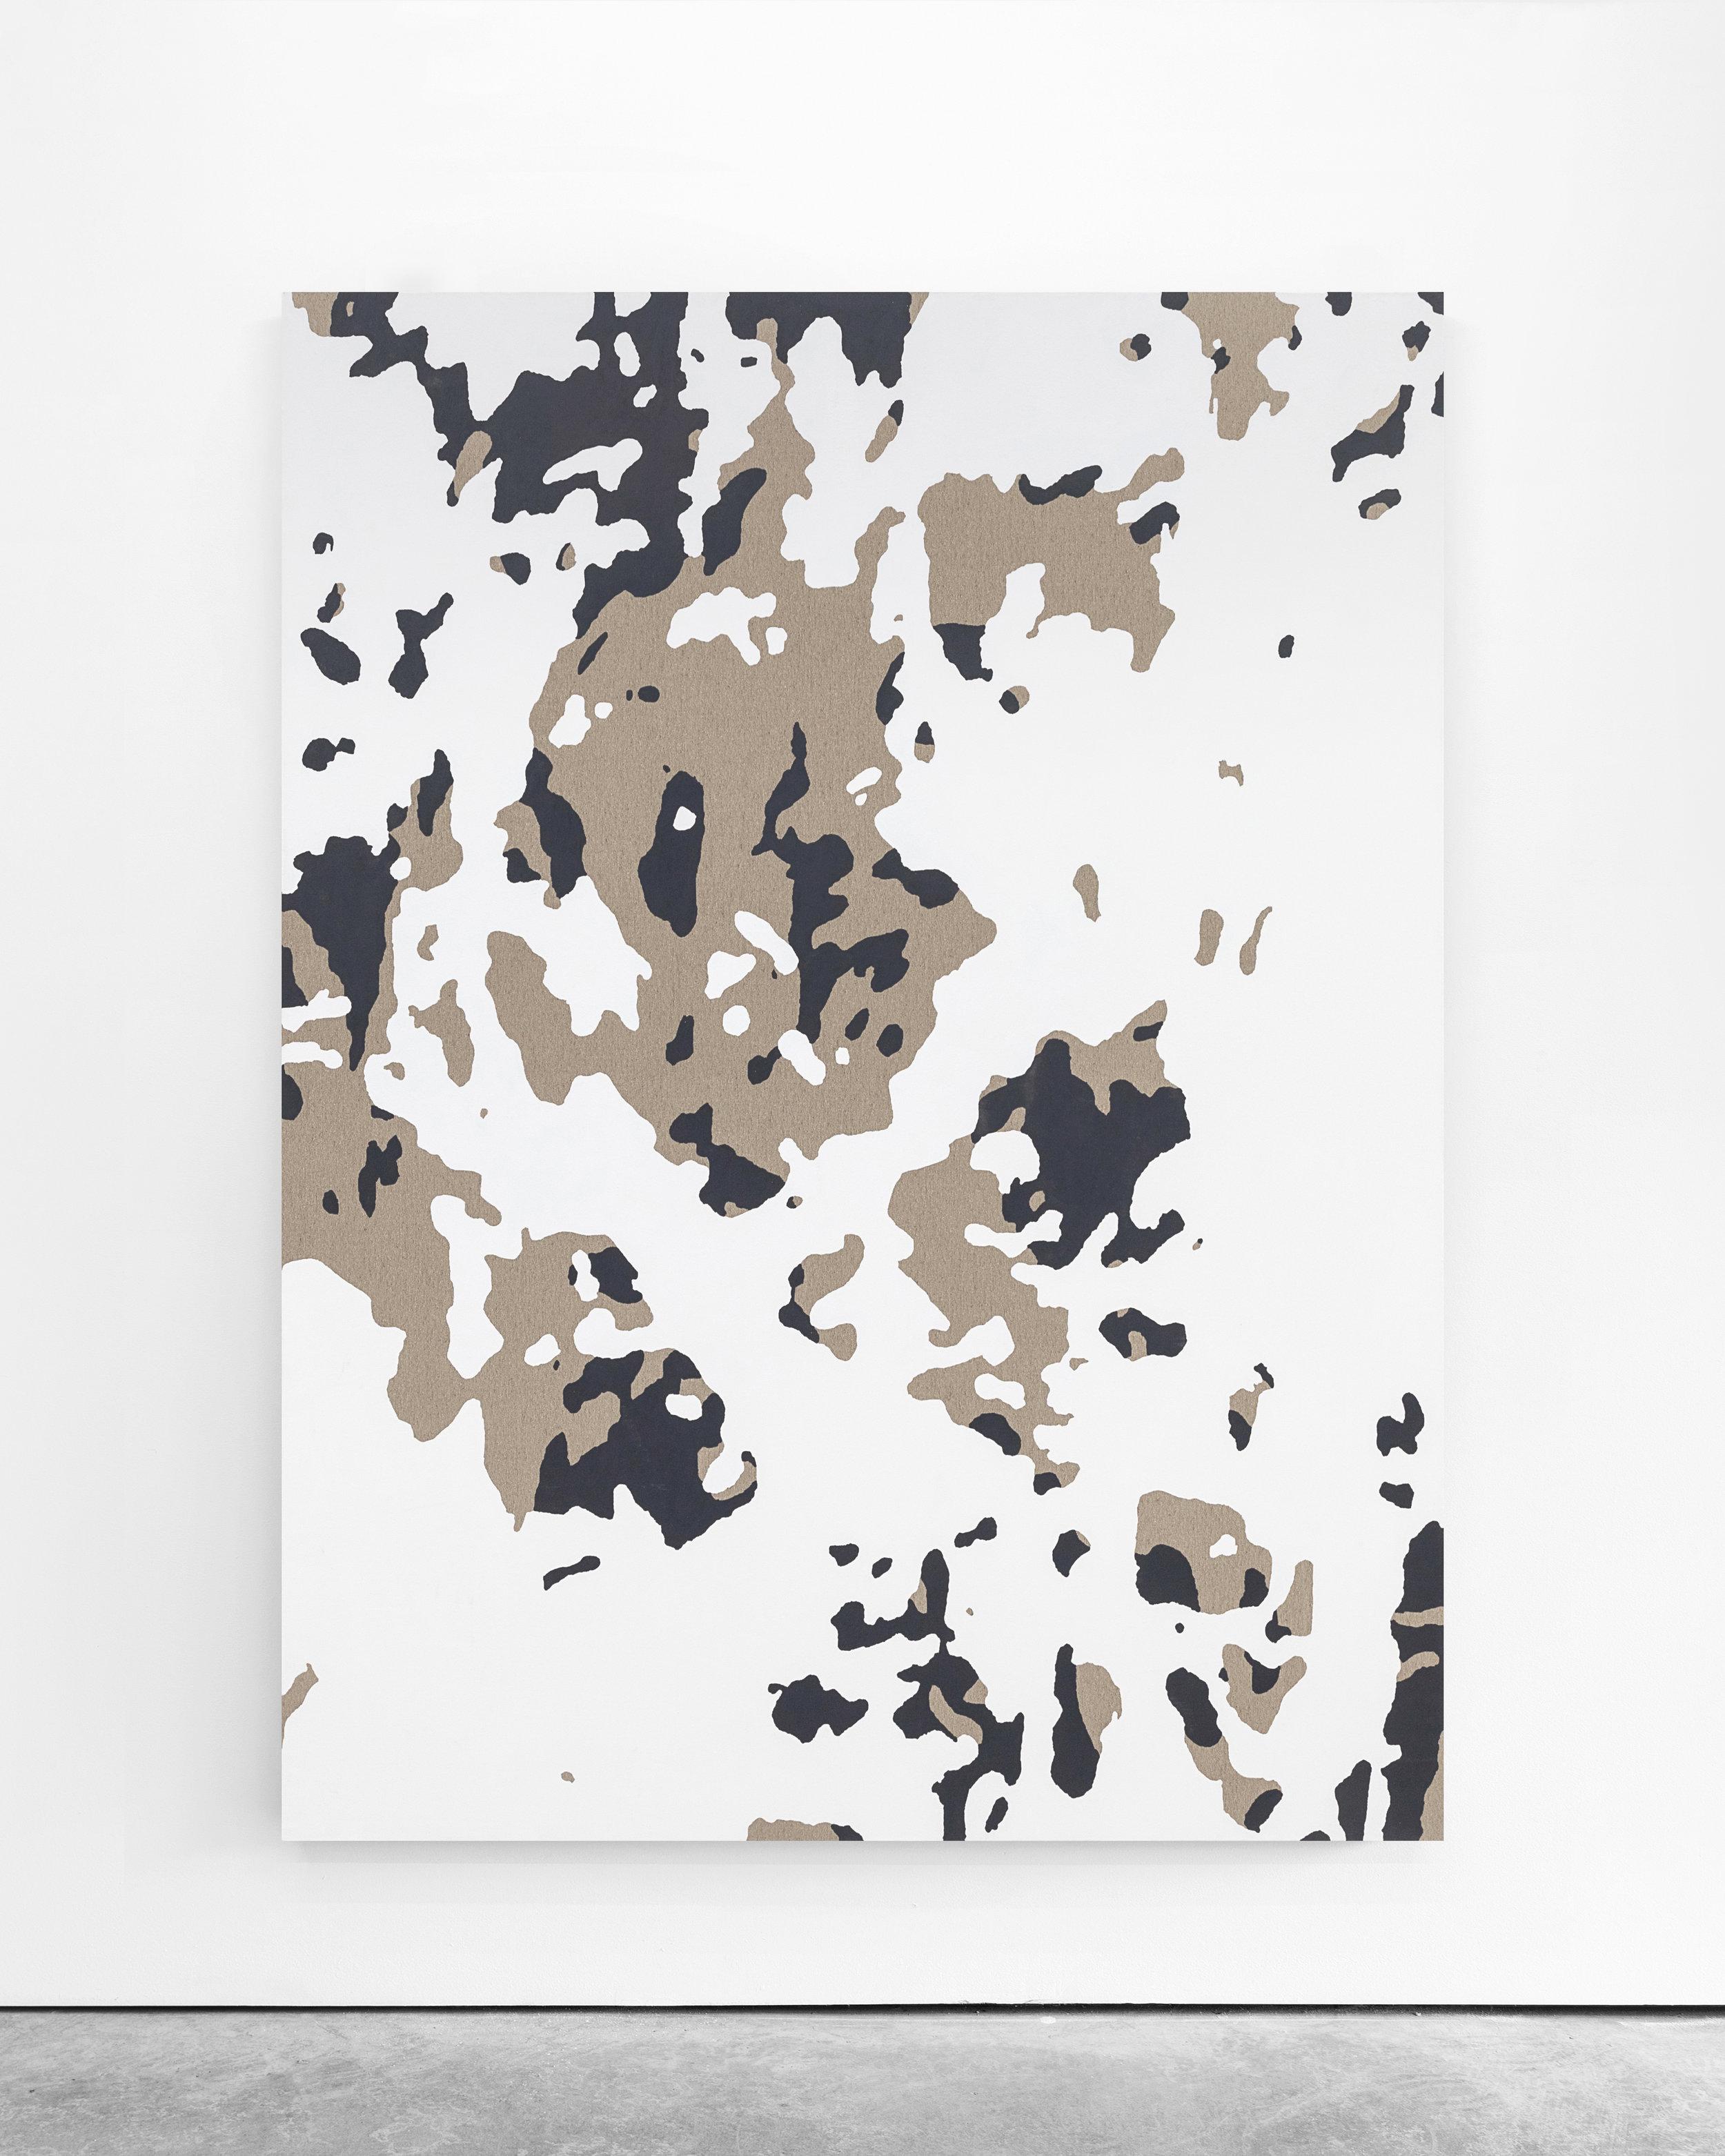 Pedro Matos  Untitled , 2018 Acrylic enamel on linen 200 x 150 cm